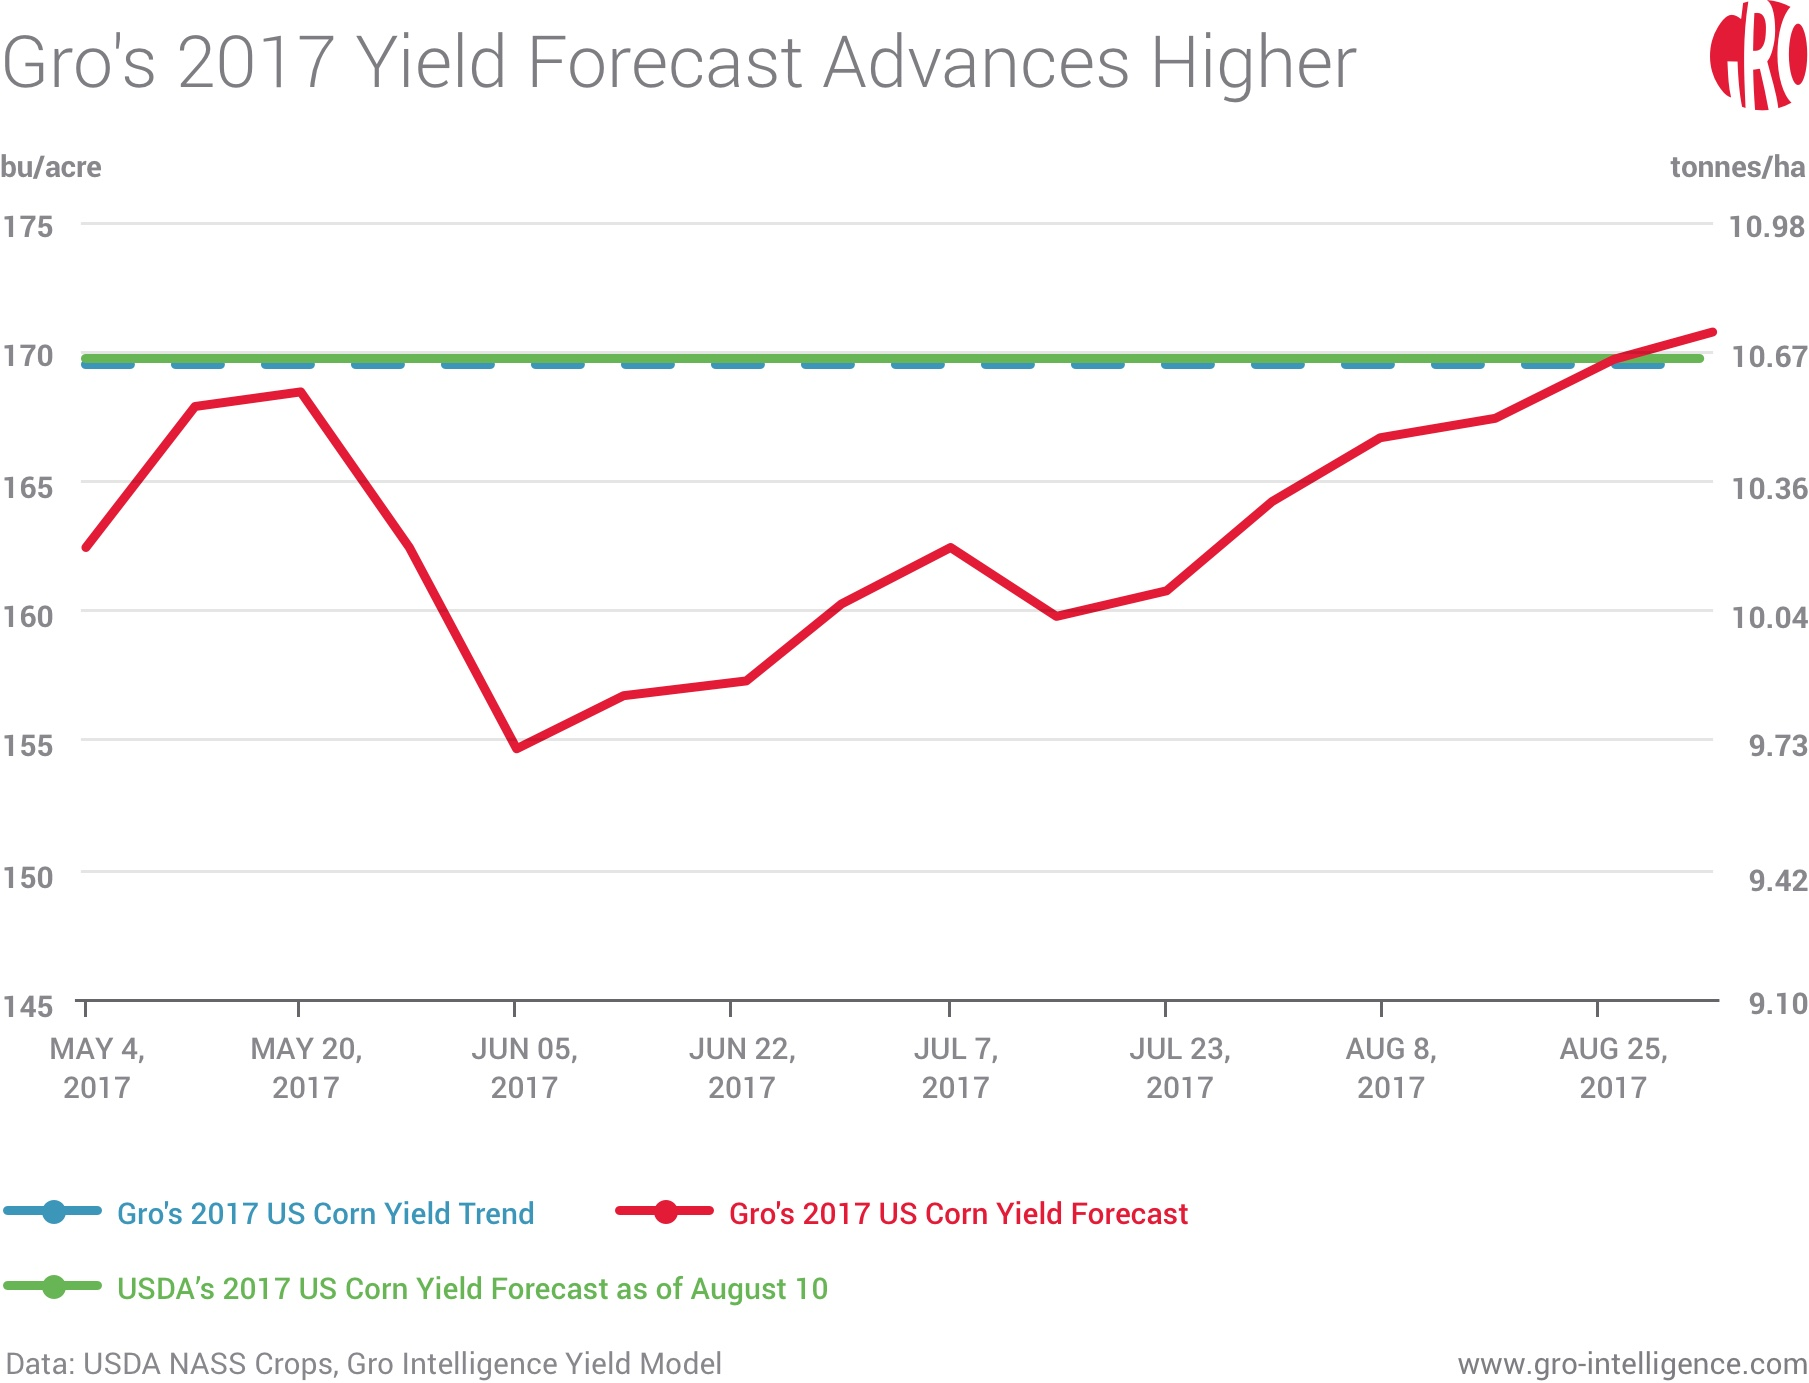 Gro's 2017 Yield Forecast Advances Higher